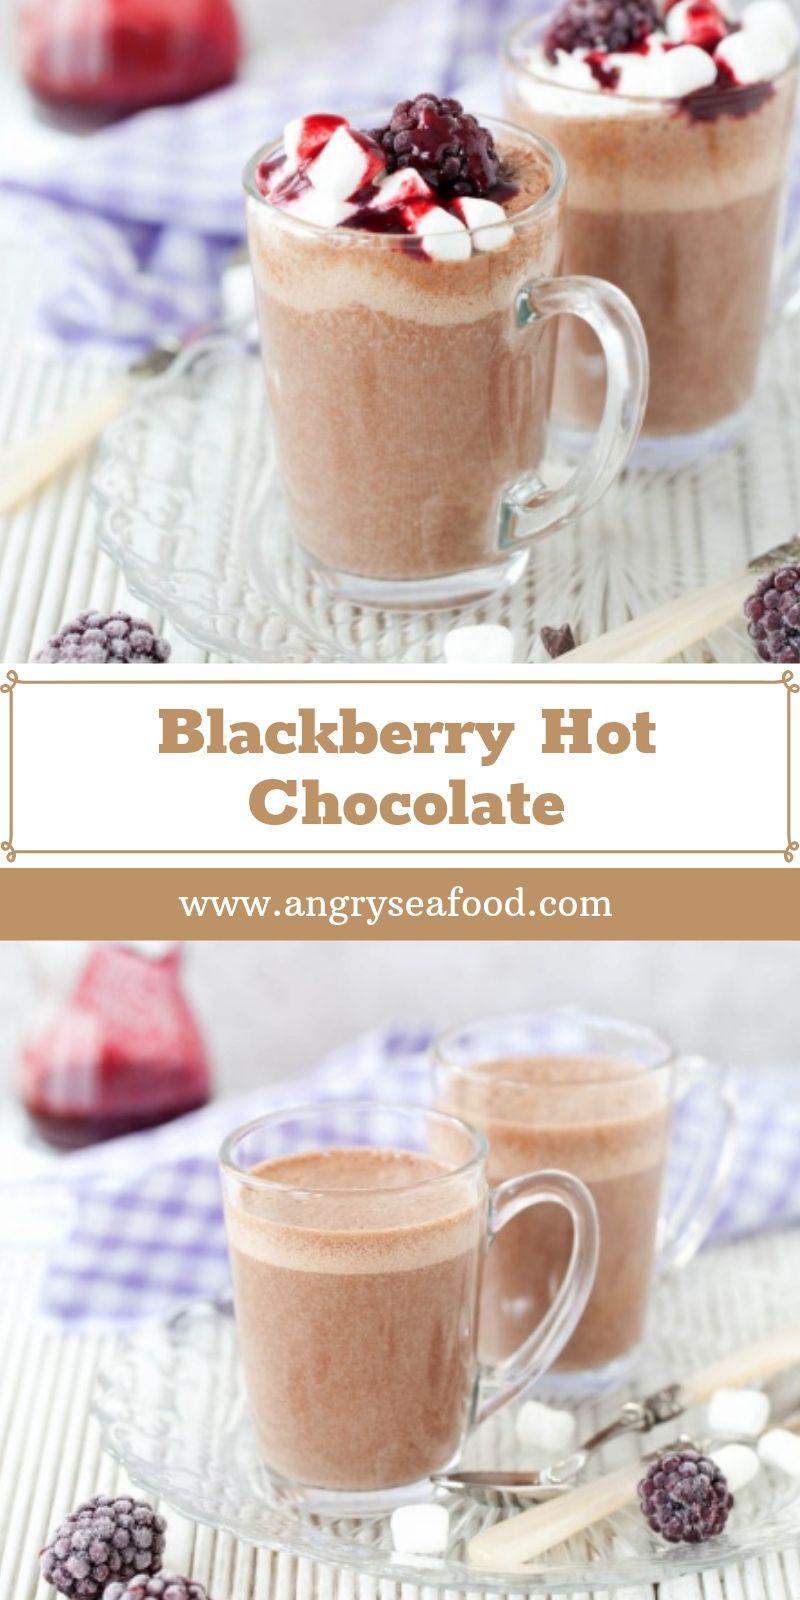 Blackberry Hot Chocolate